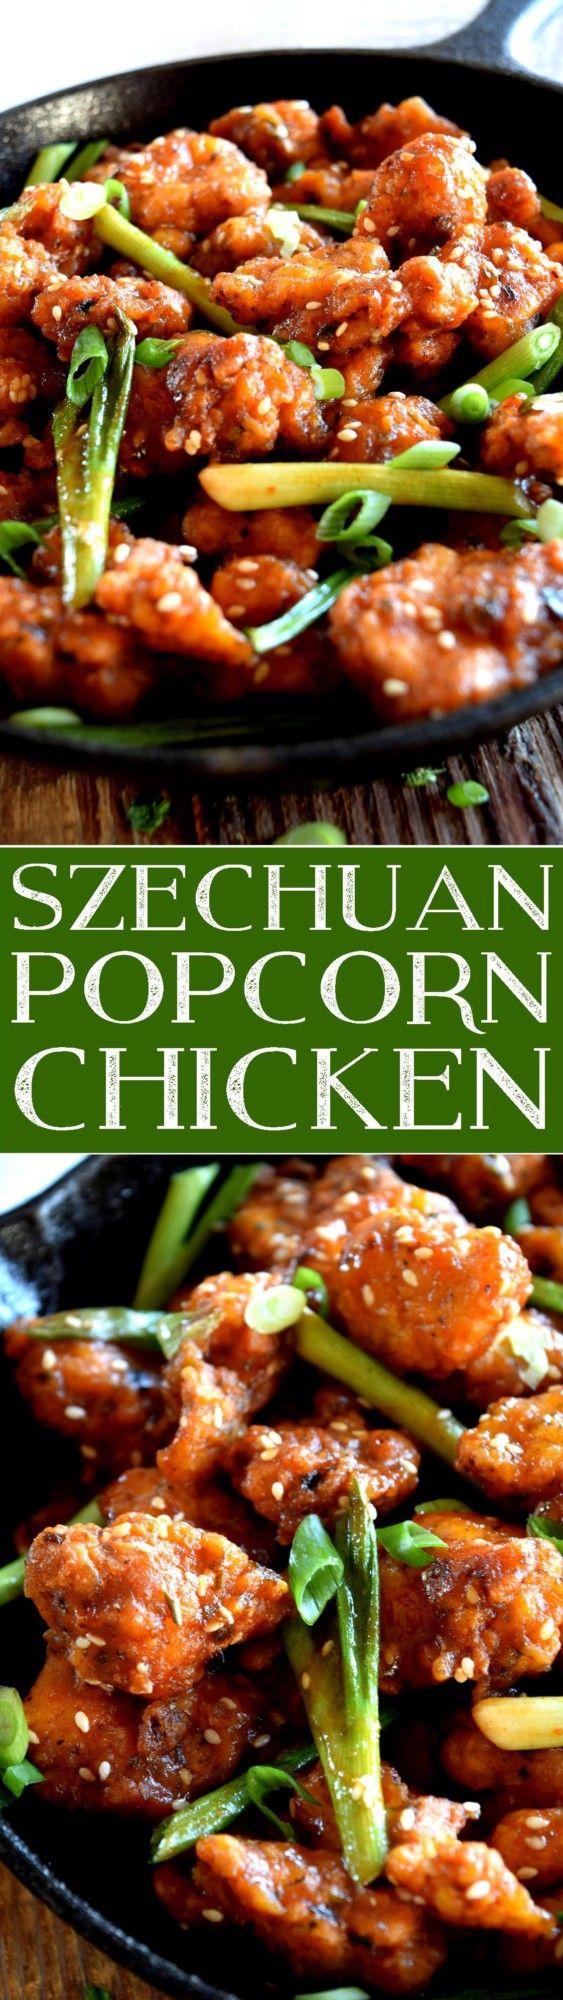 Szechuan popcorn chicken recipes viva forumfinder Image collections